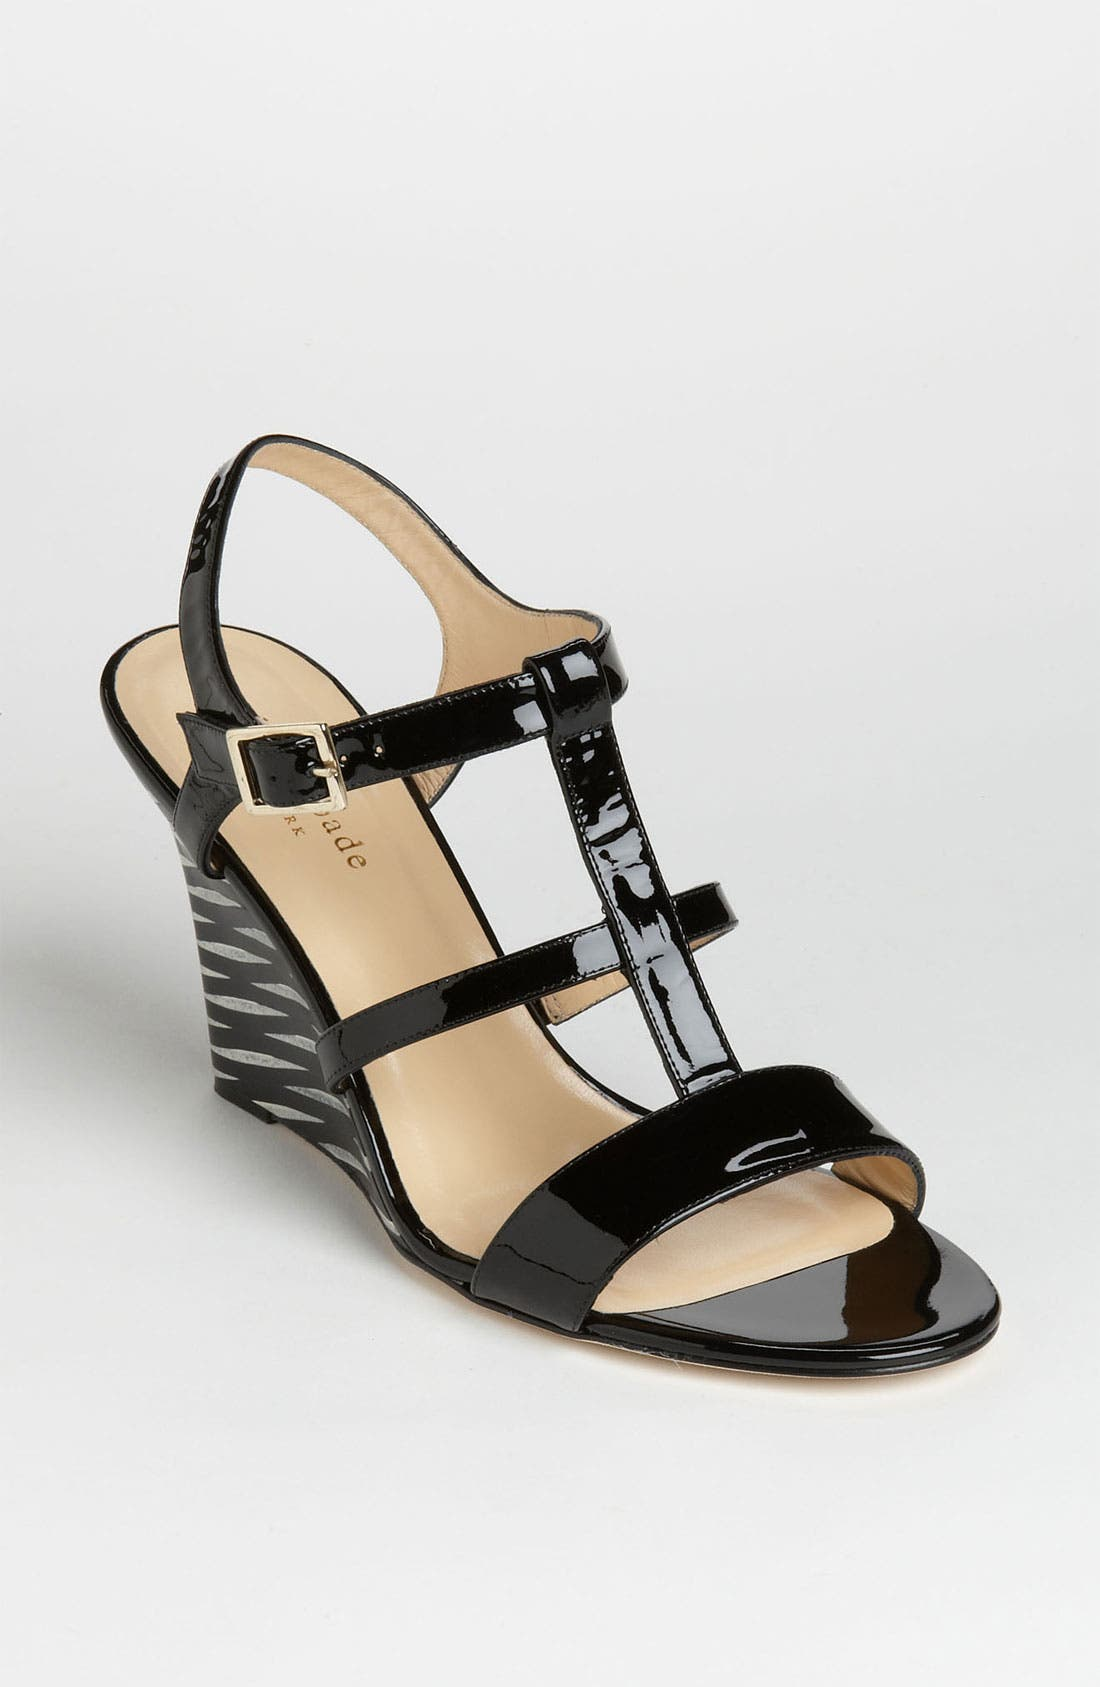 Alternate Image 1 Selected - kate spade new york 'irina' wedge sandal